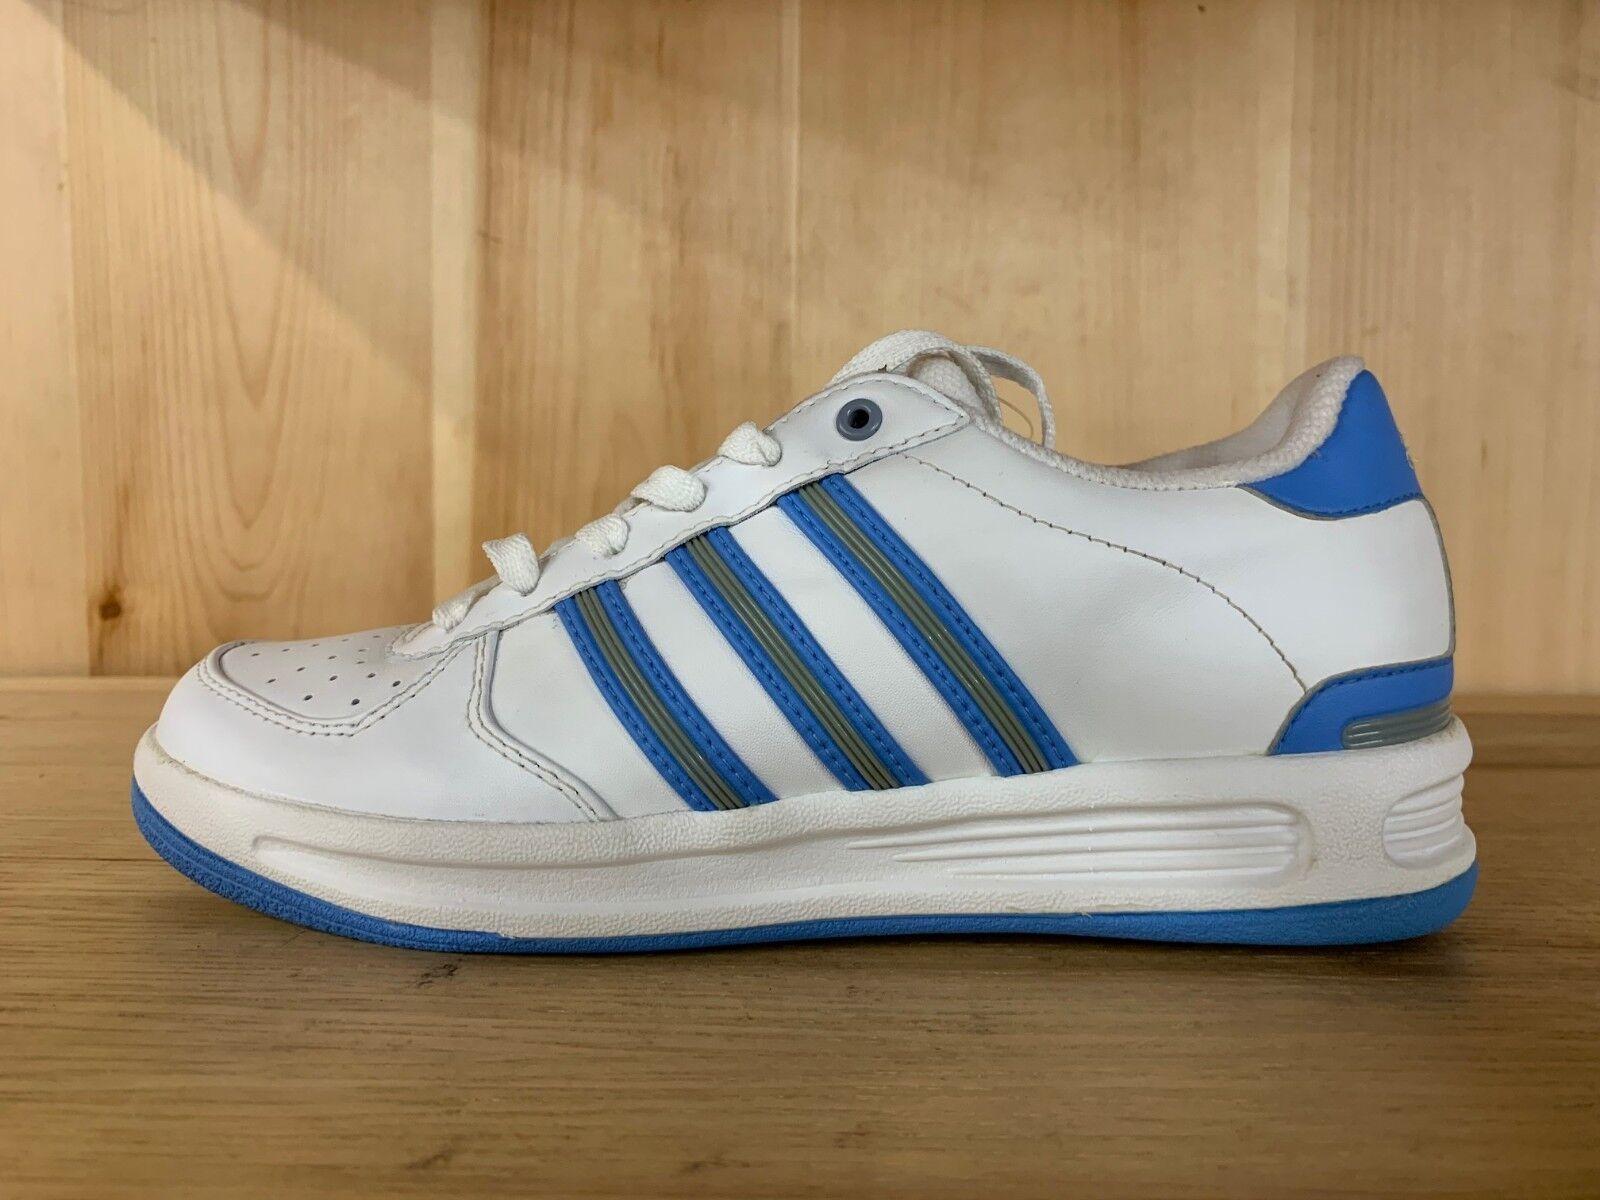 Adidas scarpe comode casual muralis muralis muralis bianco blu della donna, wmns sz 6 - 10 038475   Nuova voce    Gentiluomo/Signora Scarpa  87460f